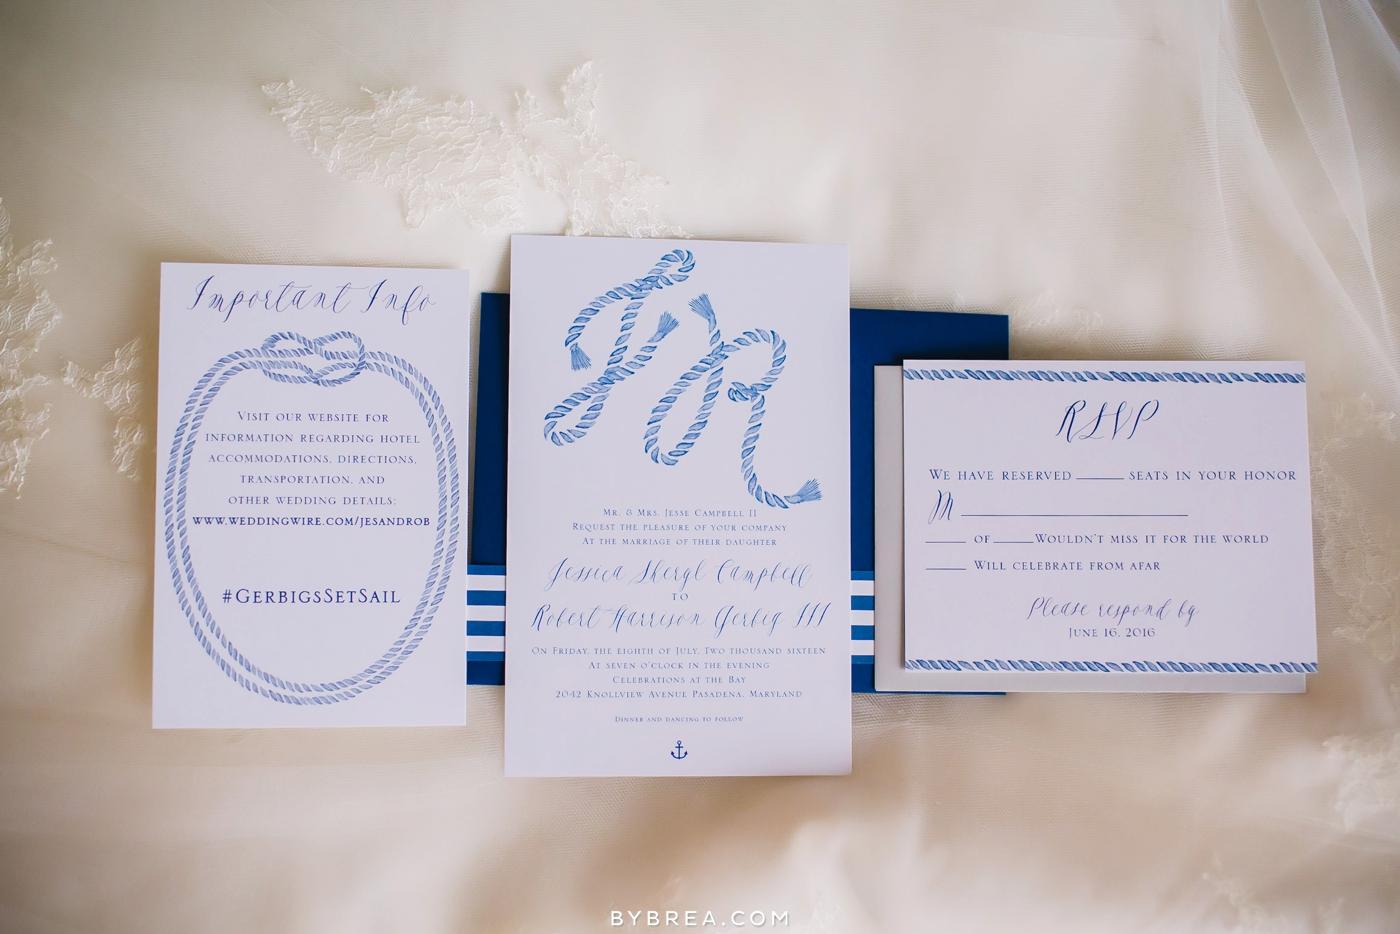 jes-rob-celebrations-at-the-bay-wedding_0231